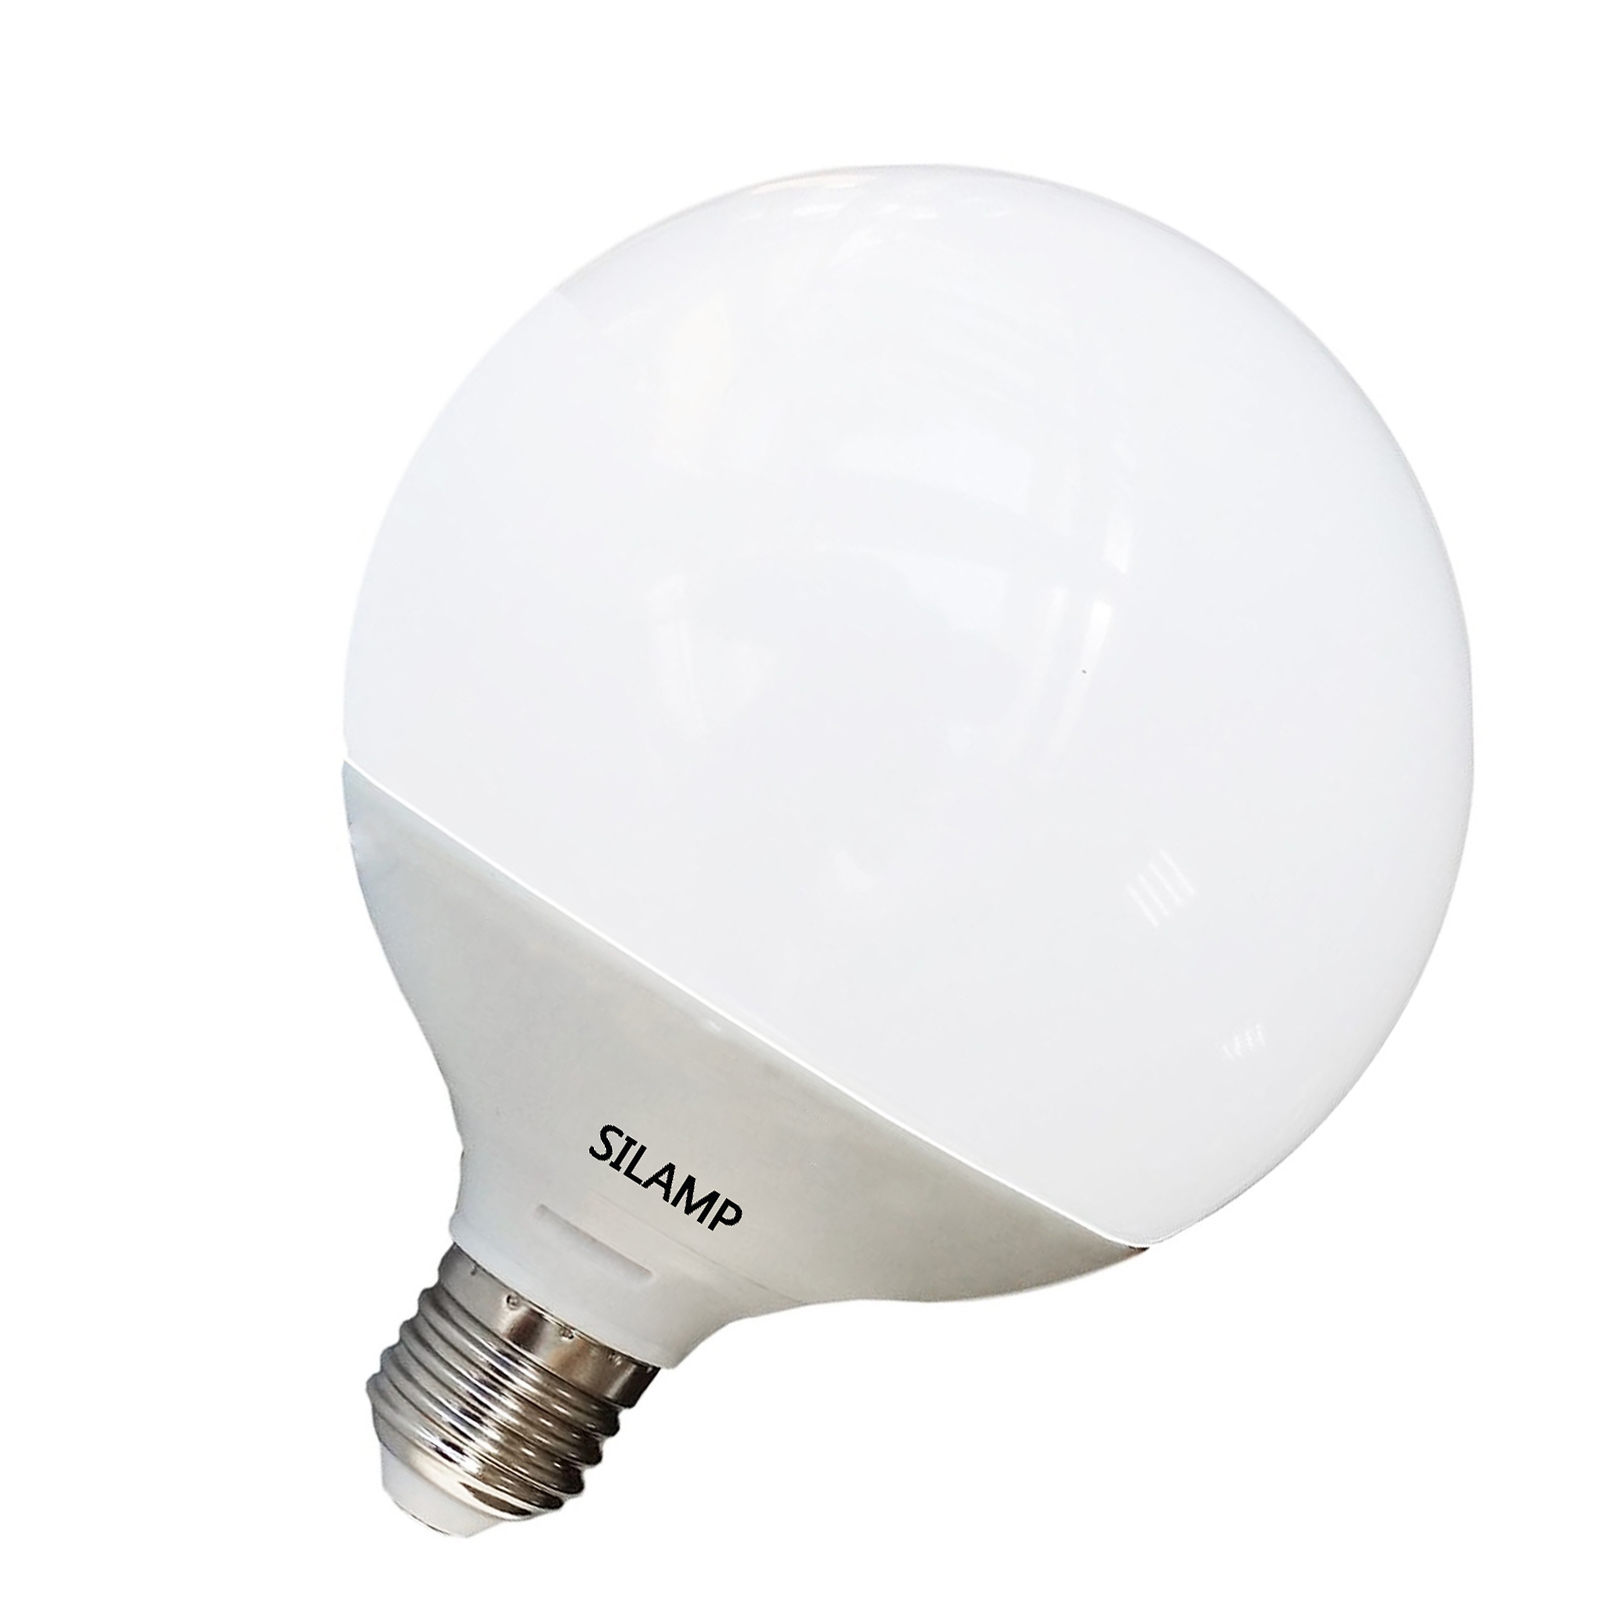 G120 18w offerte lampadine led silamp lampadina a for Offerte lampadine led